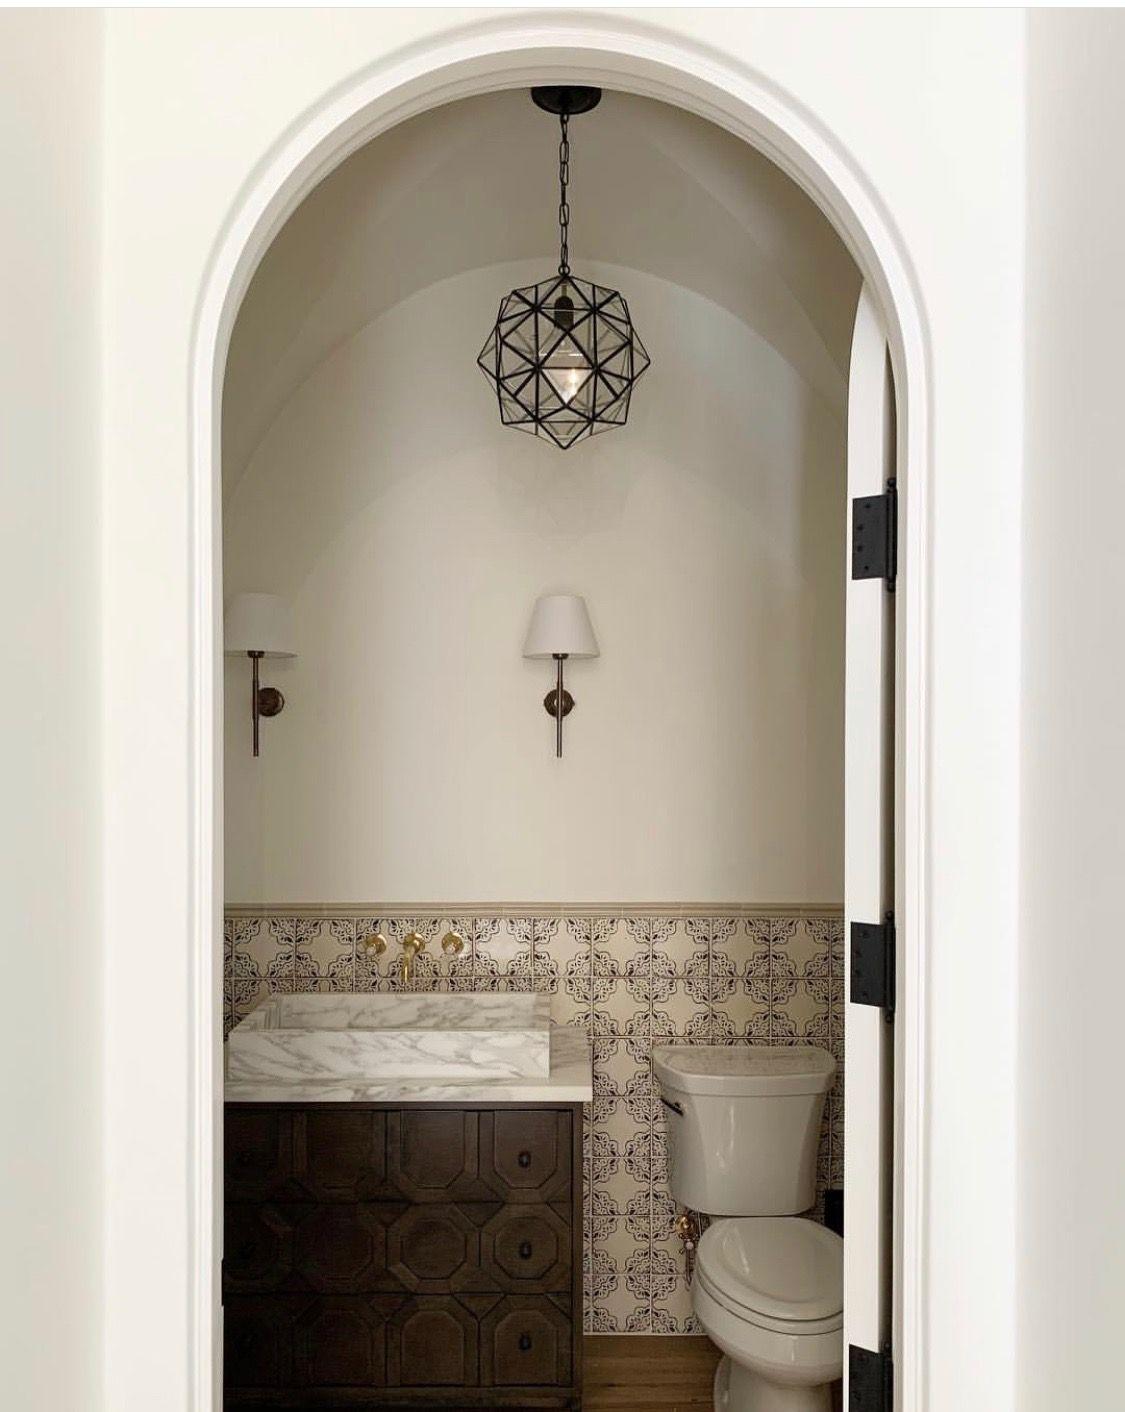 Pin By Mindy Surdacki On The Other Bathrooms Spanish Revival Bathroom Modern Spanish Decor